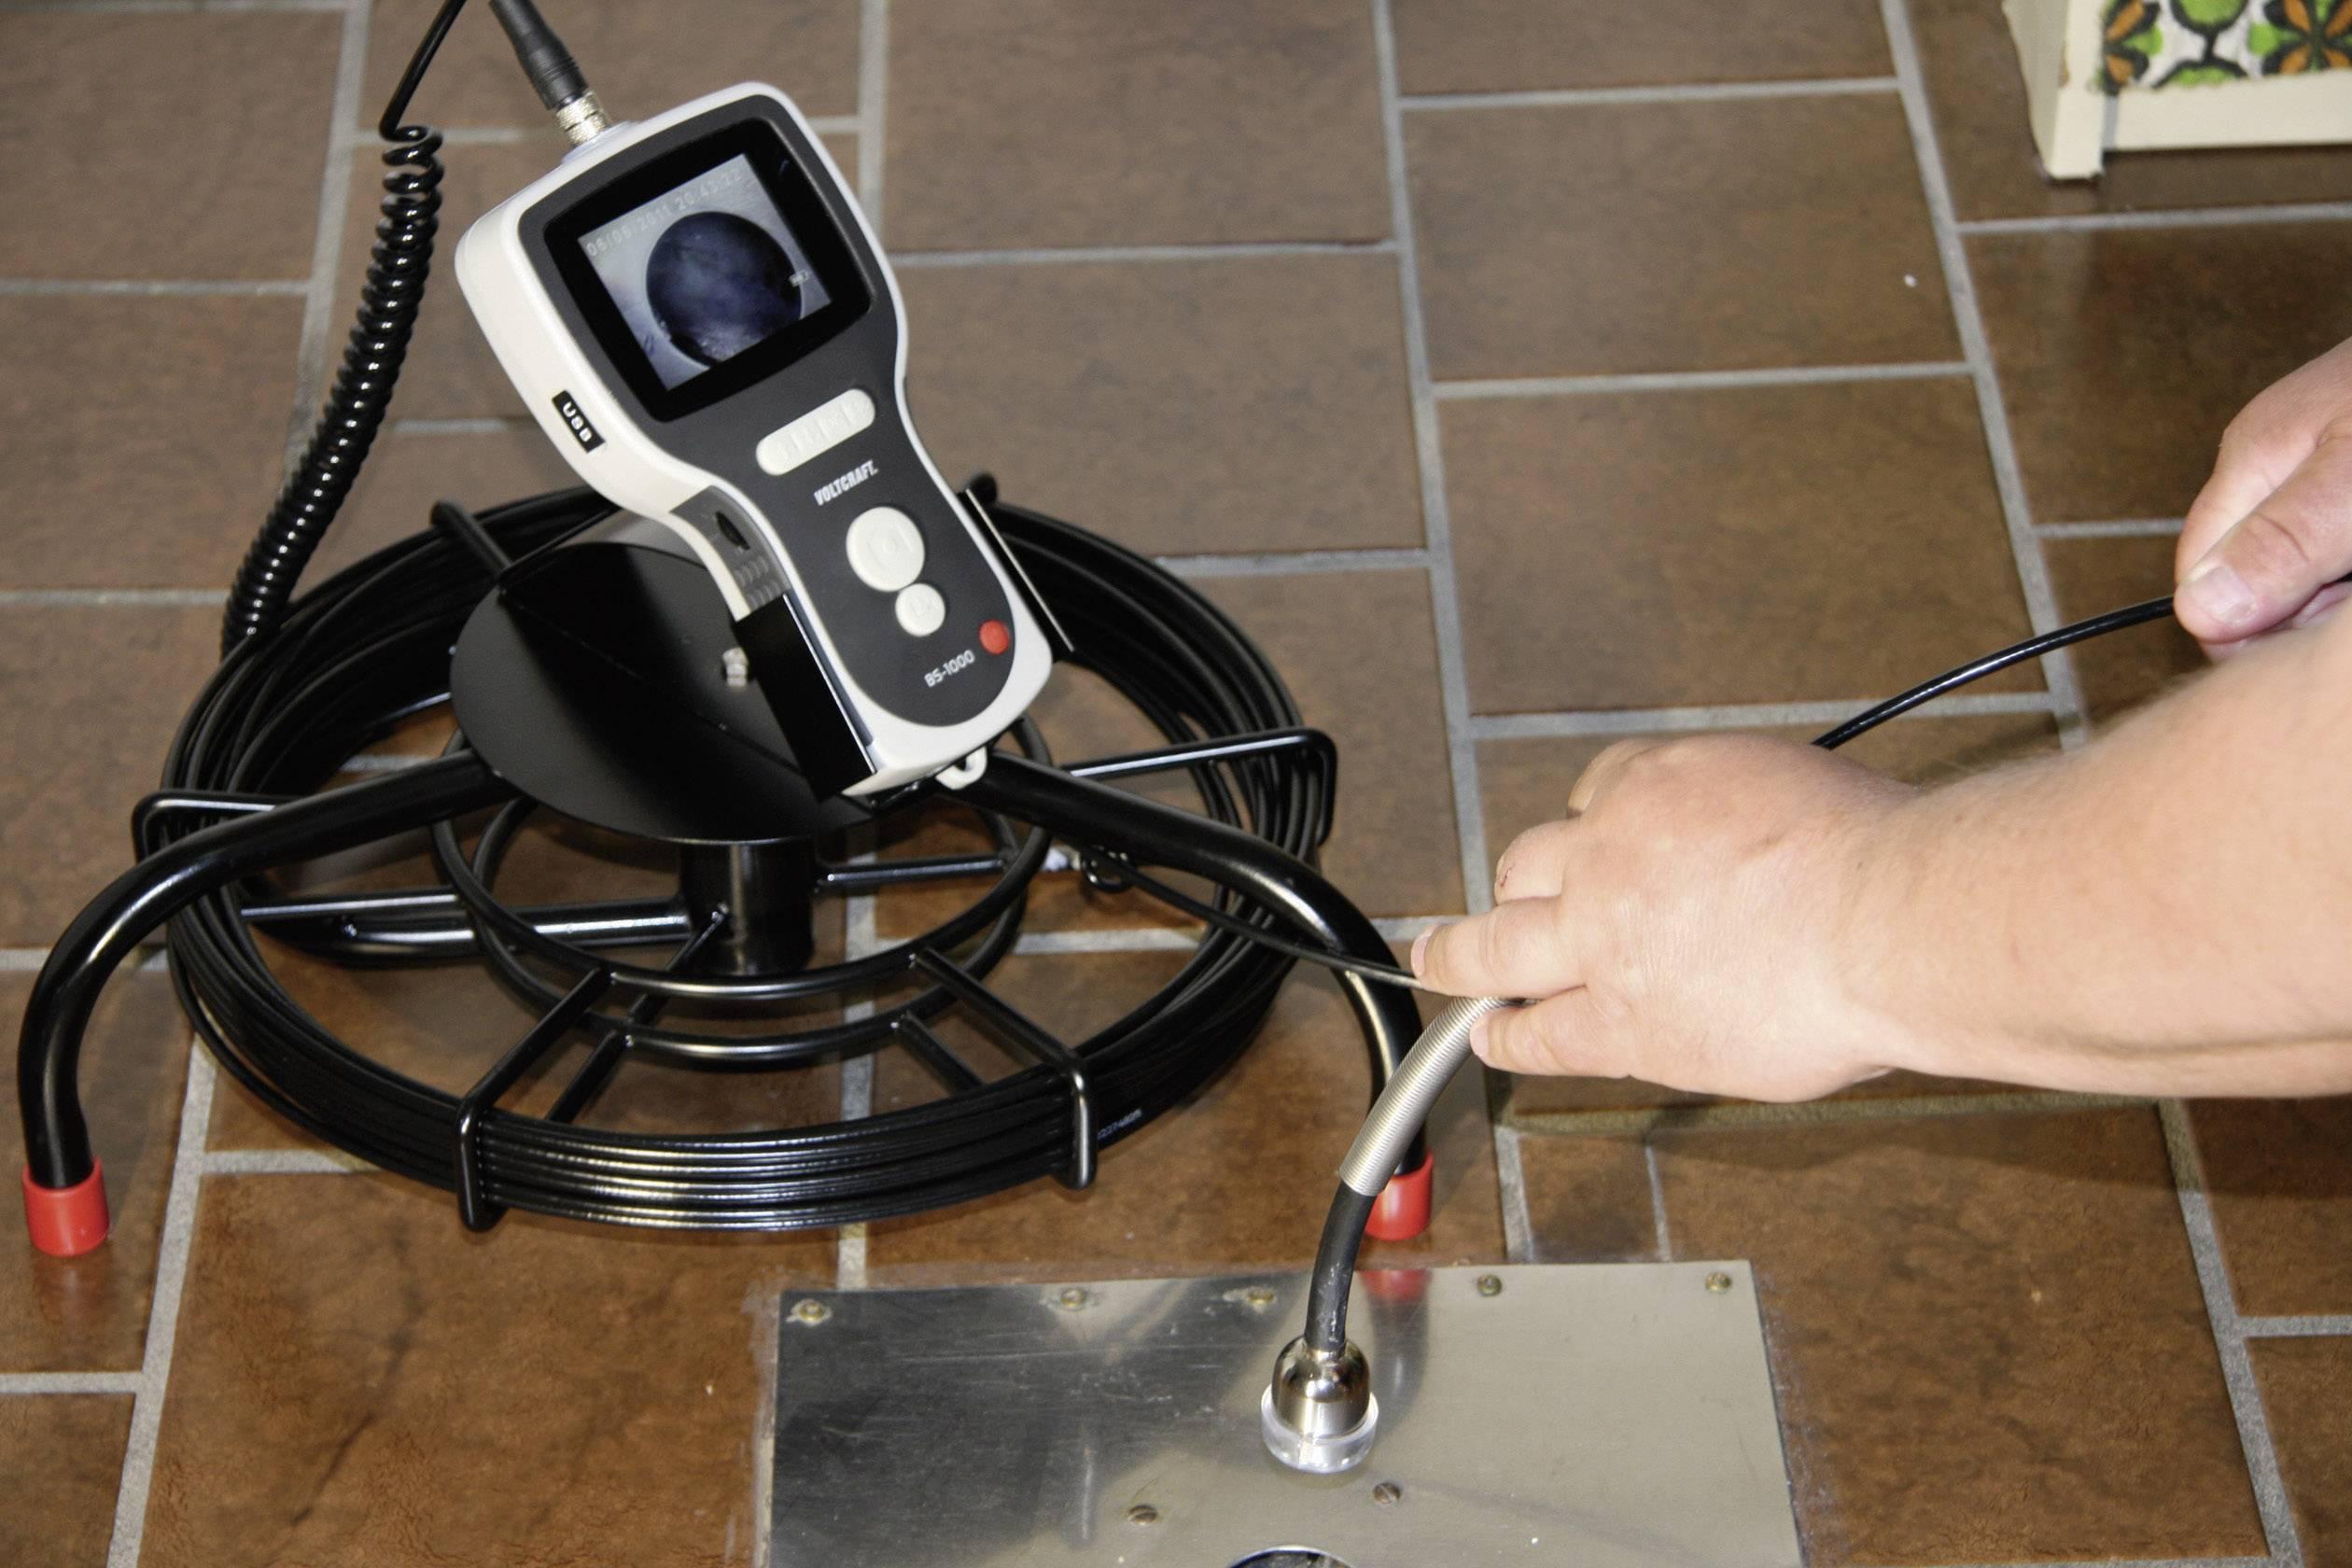 Flexibilná inšpekčná kamera pre endoskop Voltcraft BS-1000T, 25 m